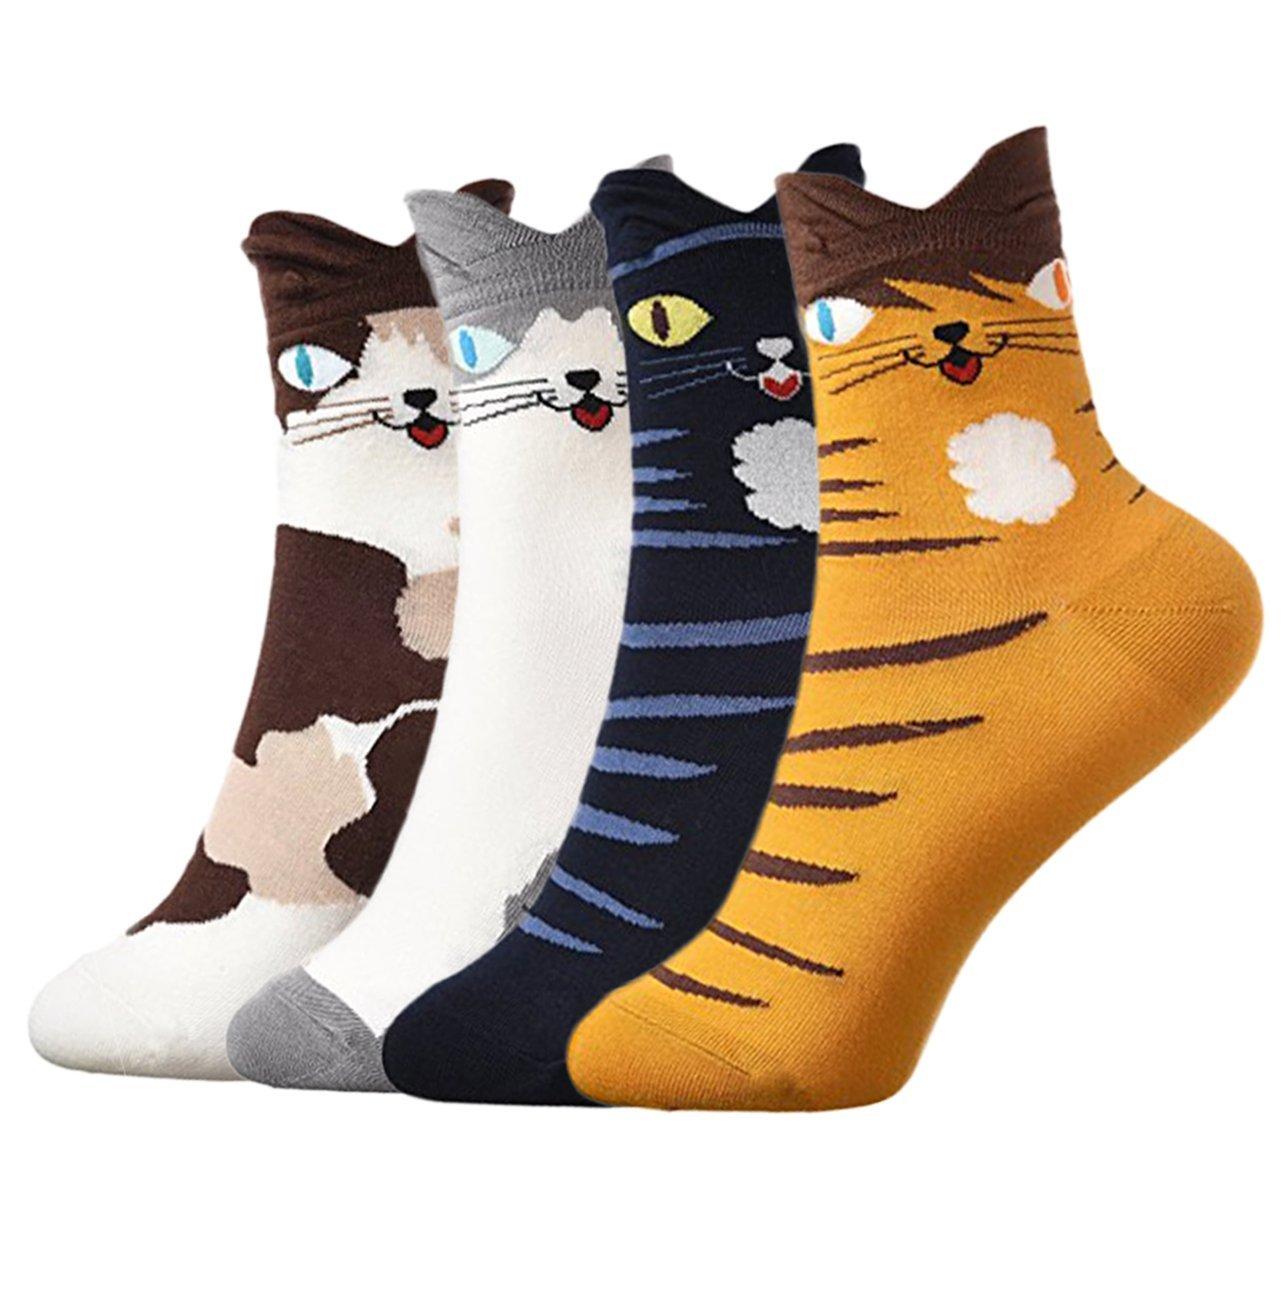 Girl Cartoon Socks,Animal Cats Dogs Pattern Cute Cotton Novelty Crew Socks 4 Pairs-Gift Idea (Cat)